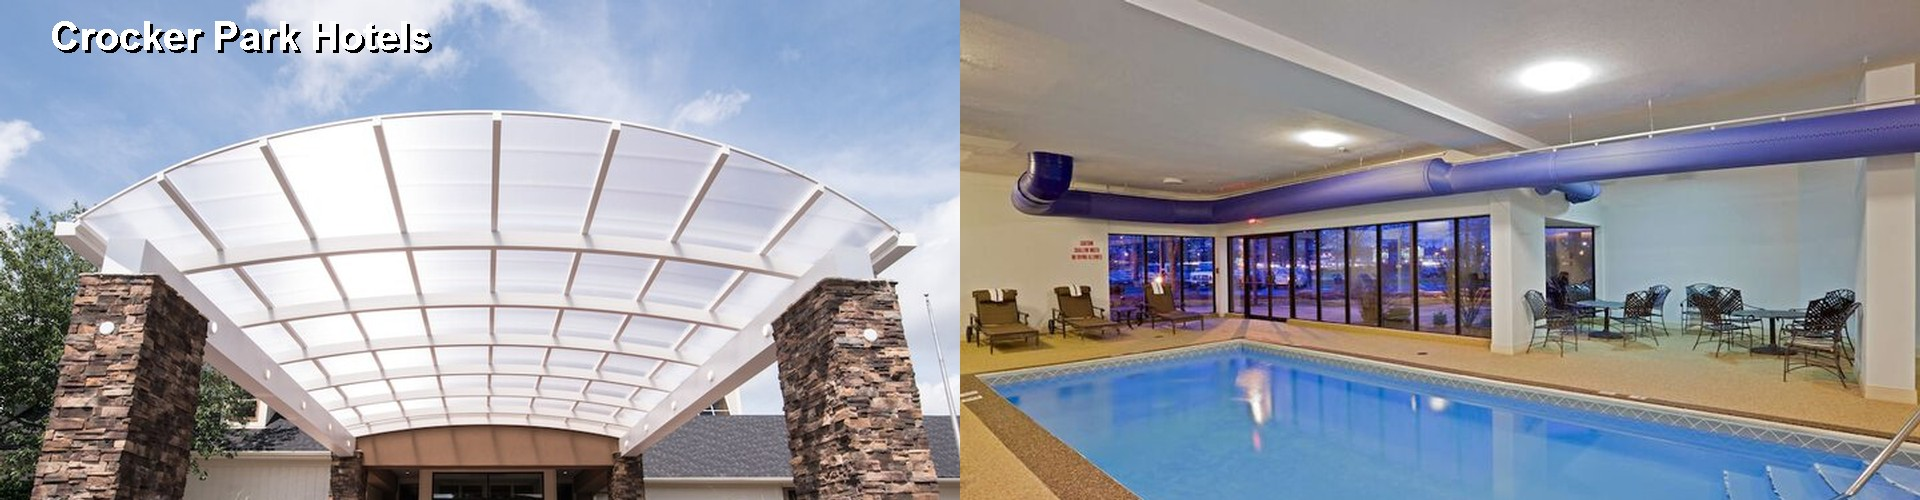 5 Best Hotels Near Crocker Park